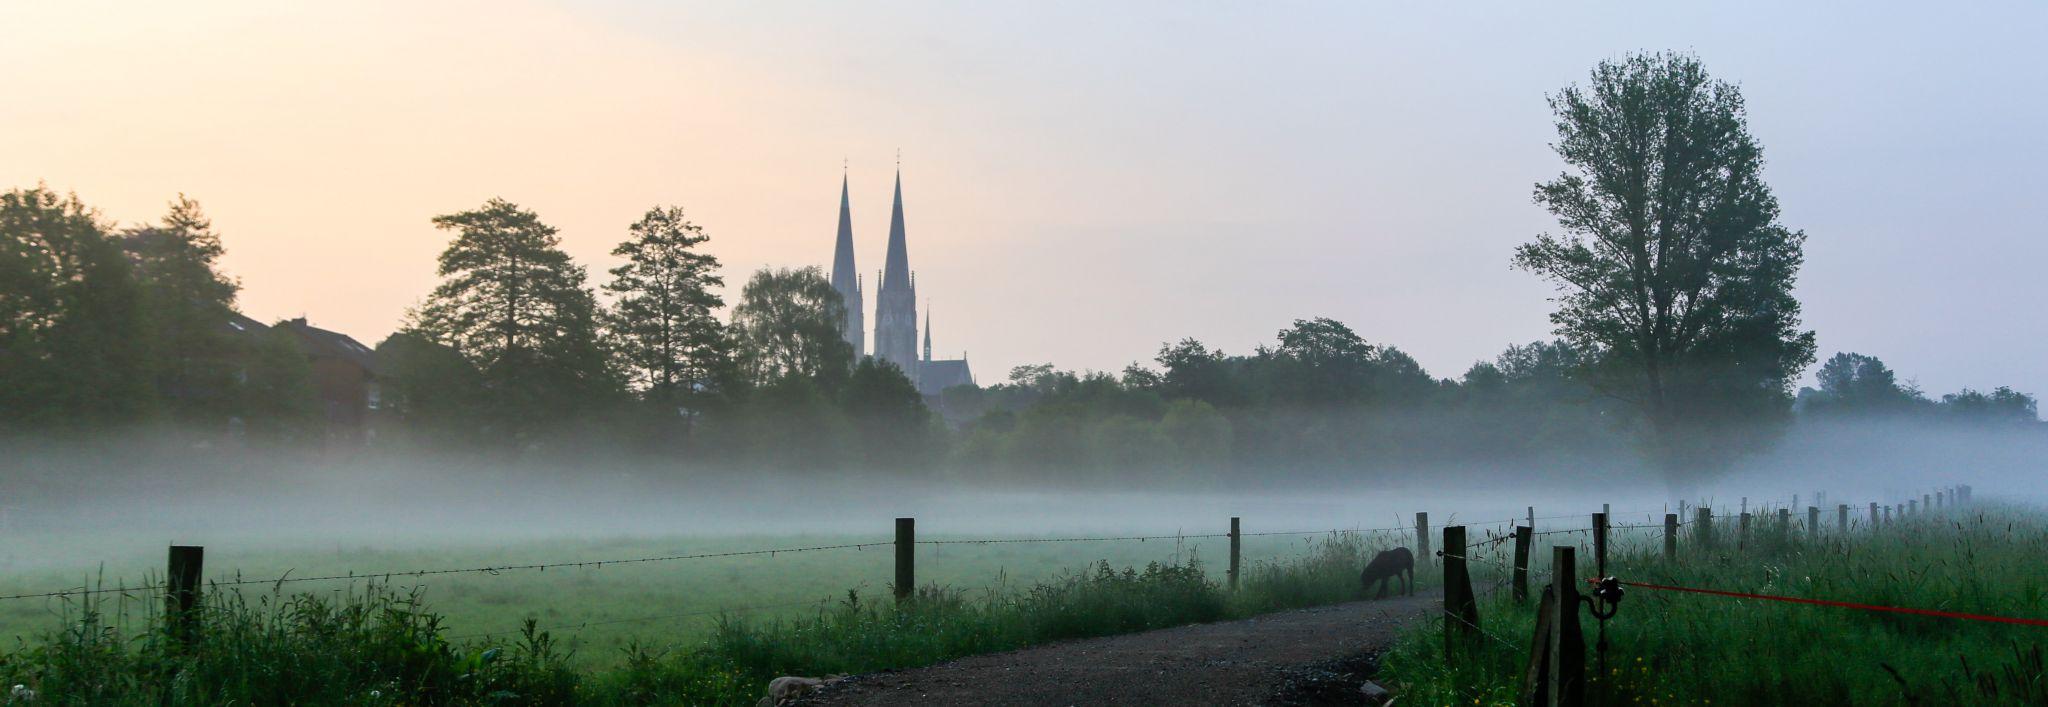 Billerbeck am Morgen, Germany